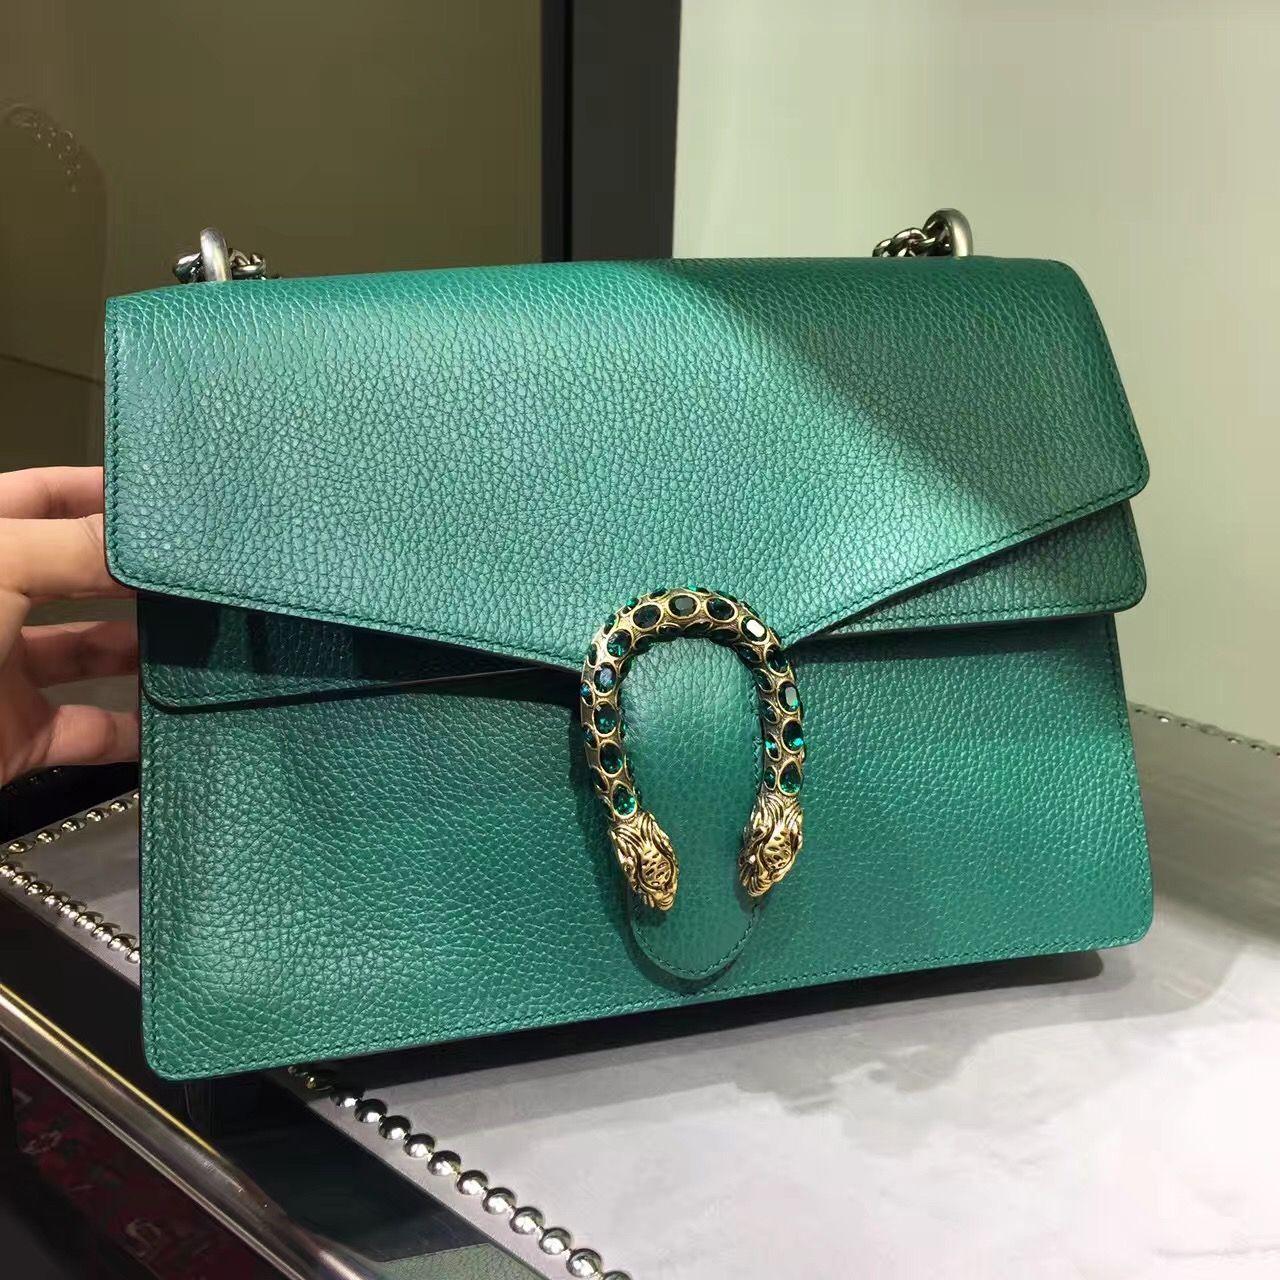 Gucci Dionysus Mini Green